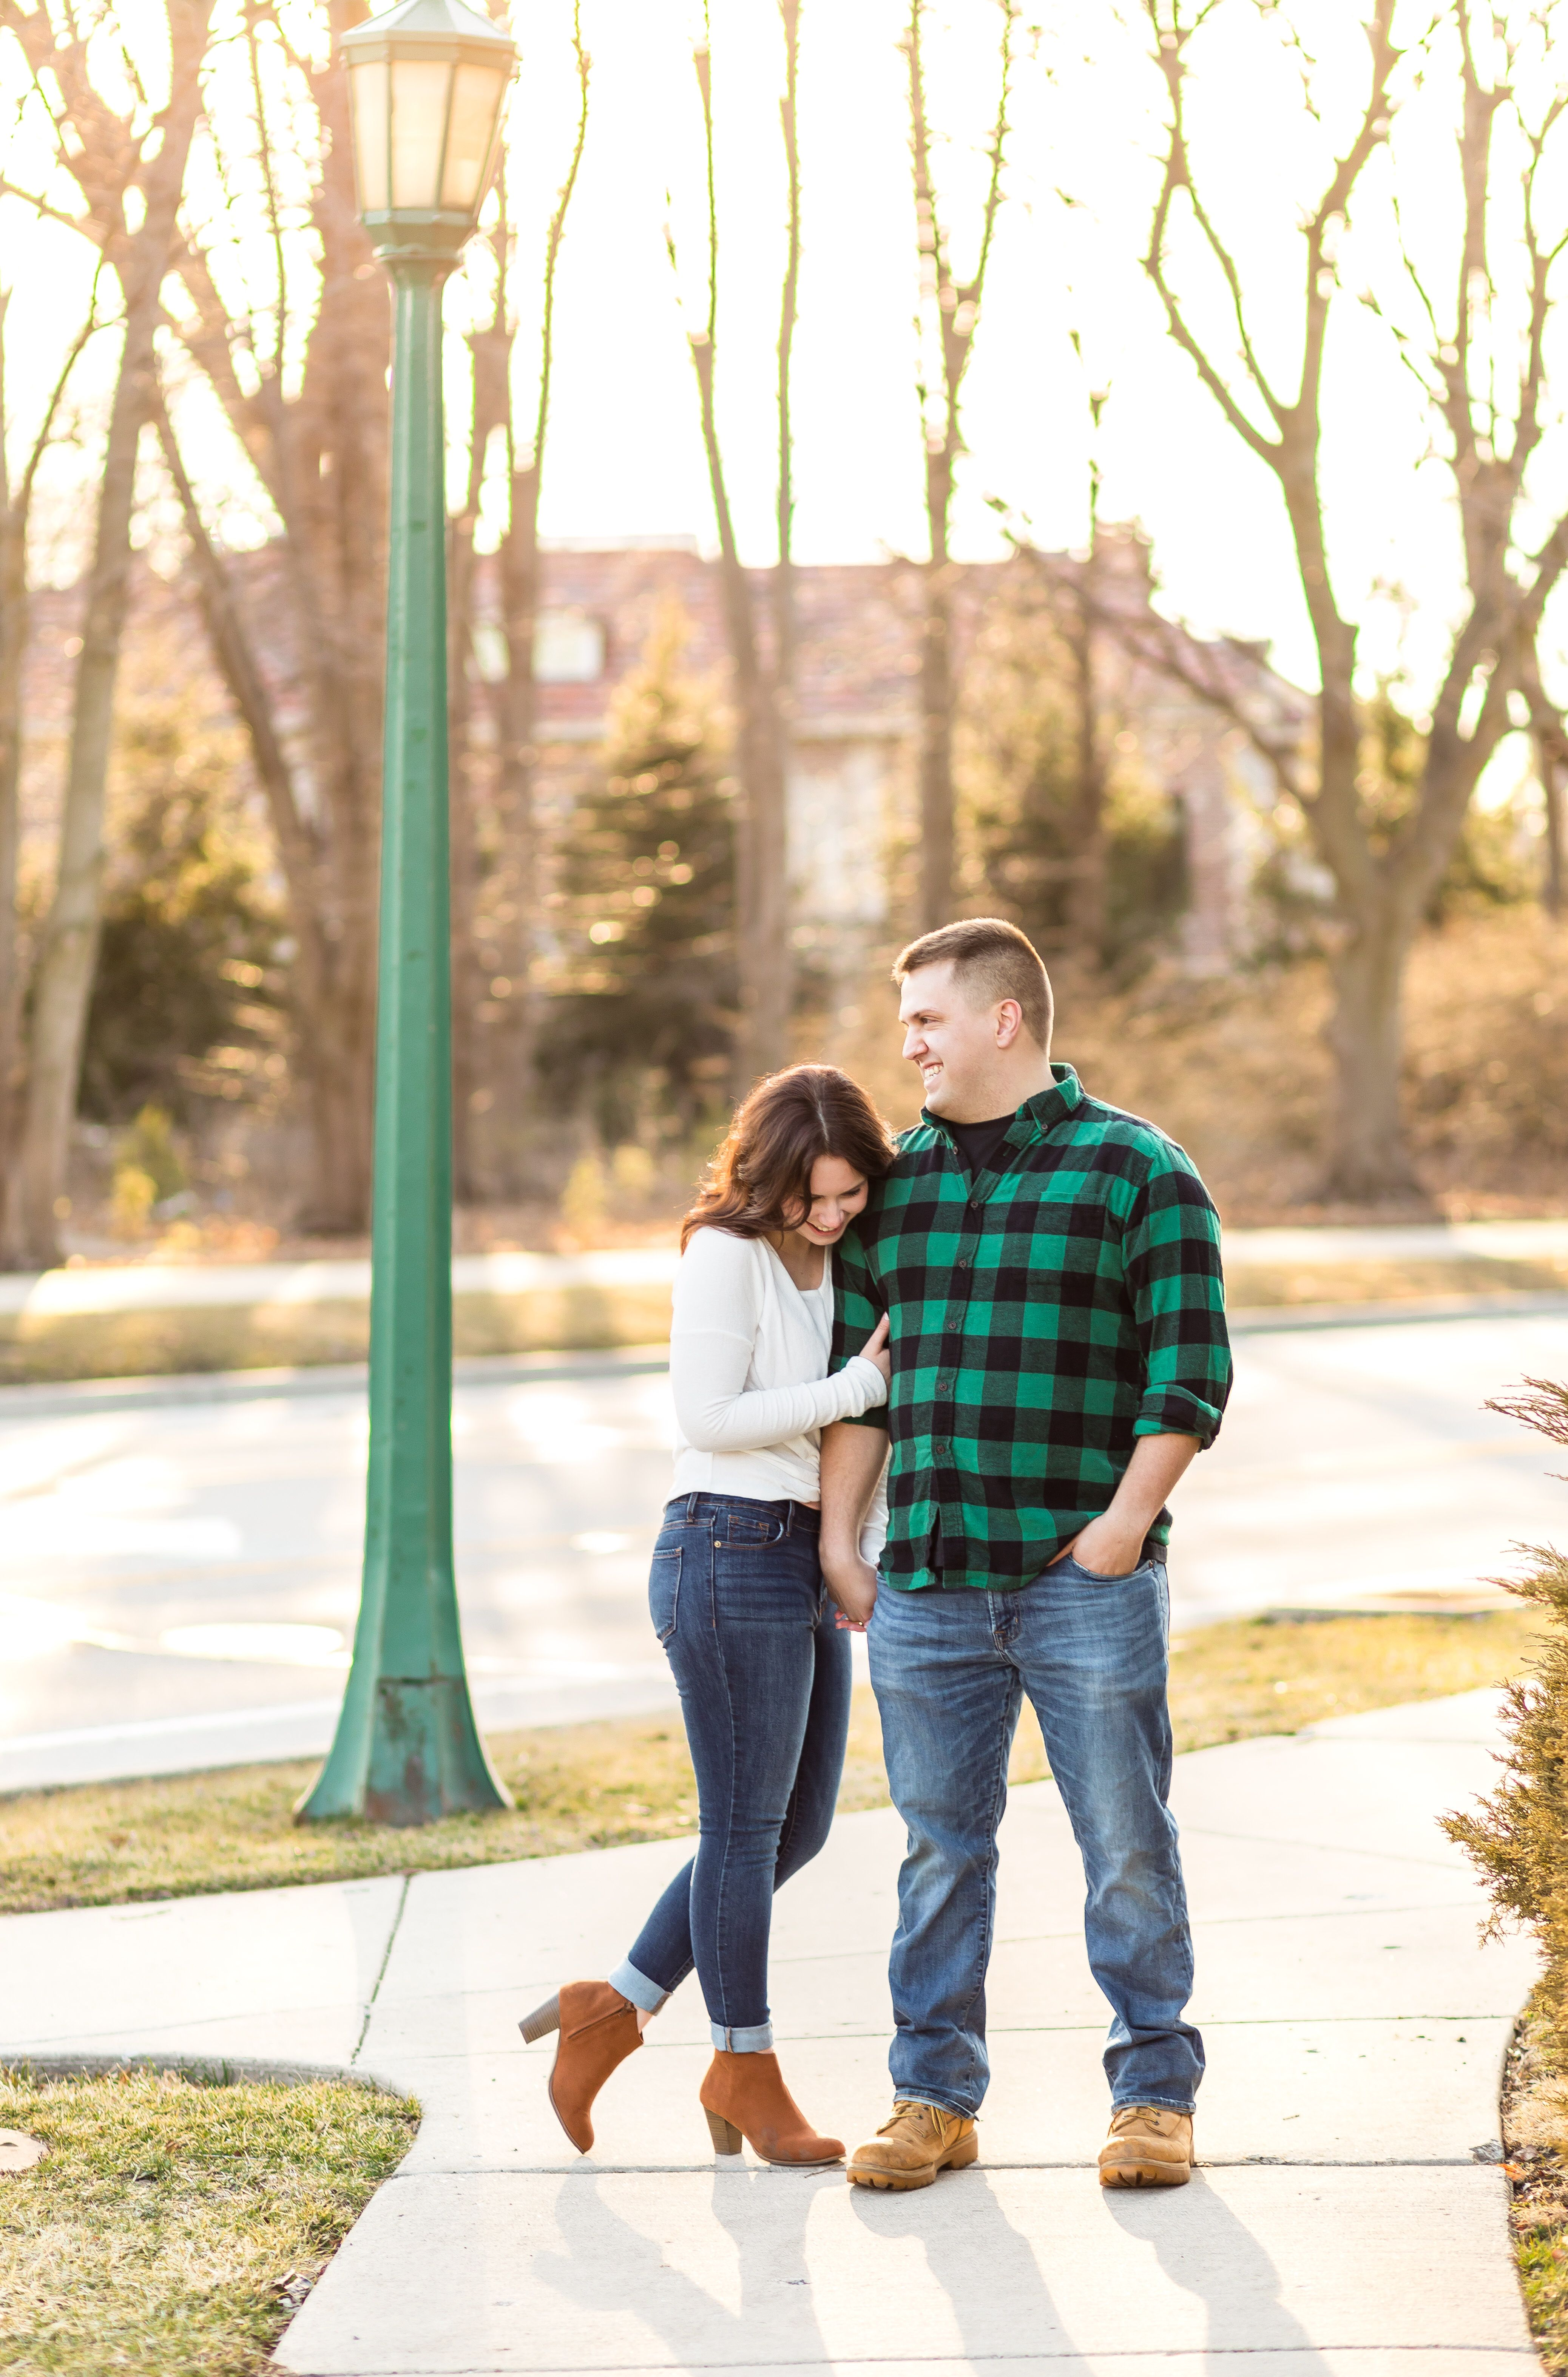 Evanston dating